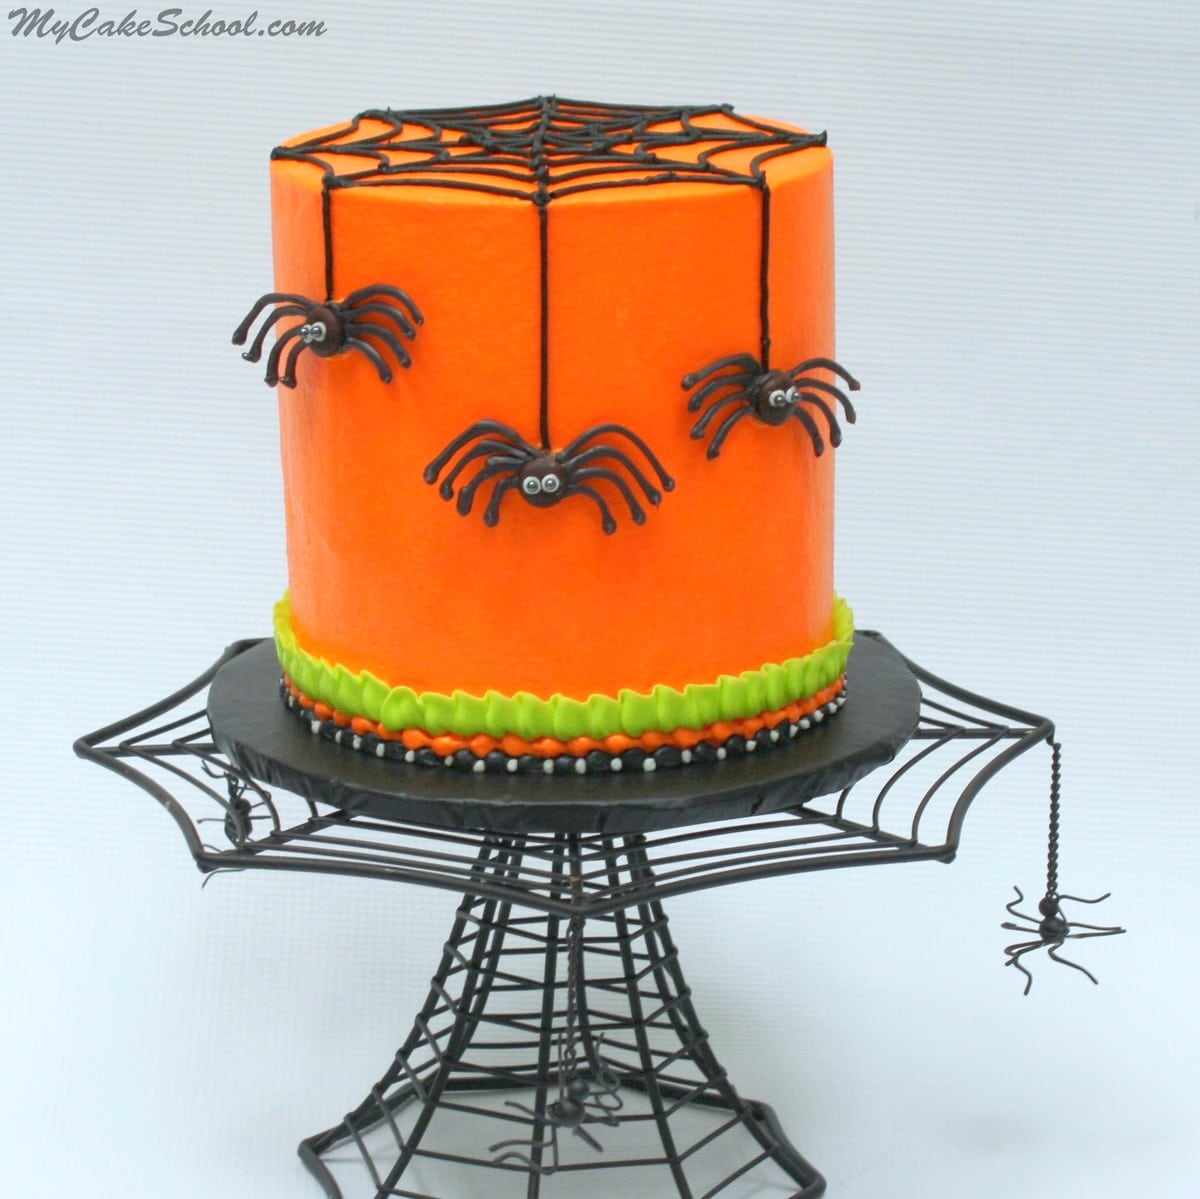 Halloween Spider Cake Decoration : Chocolate Spiders! Free Halloween Cake Video My Cake School